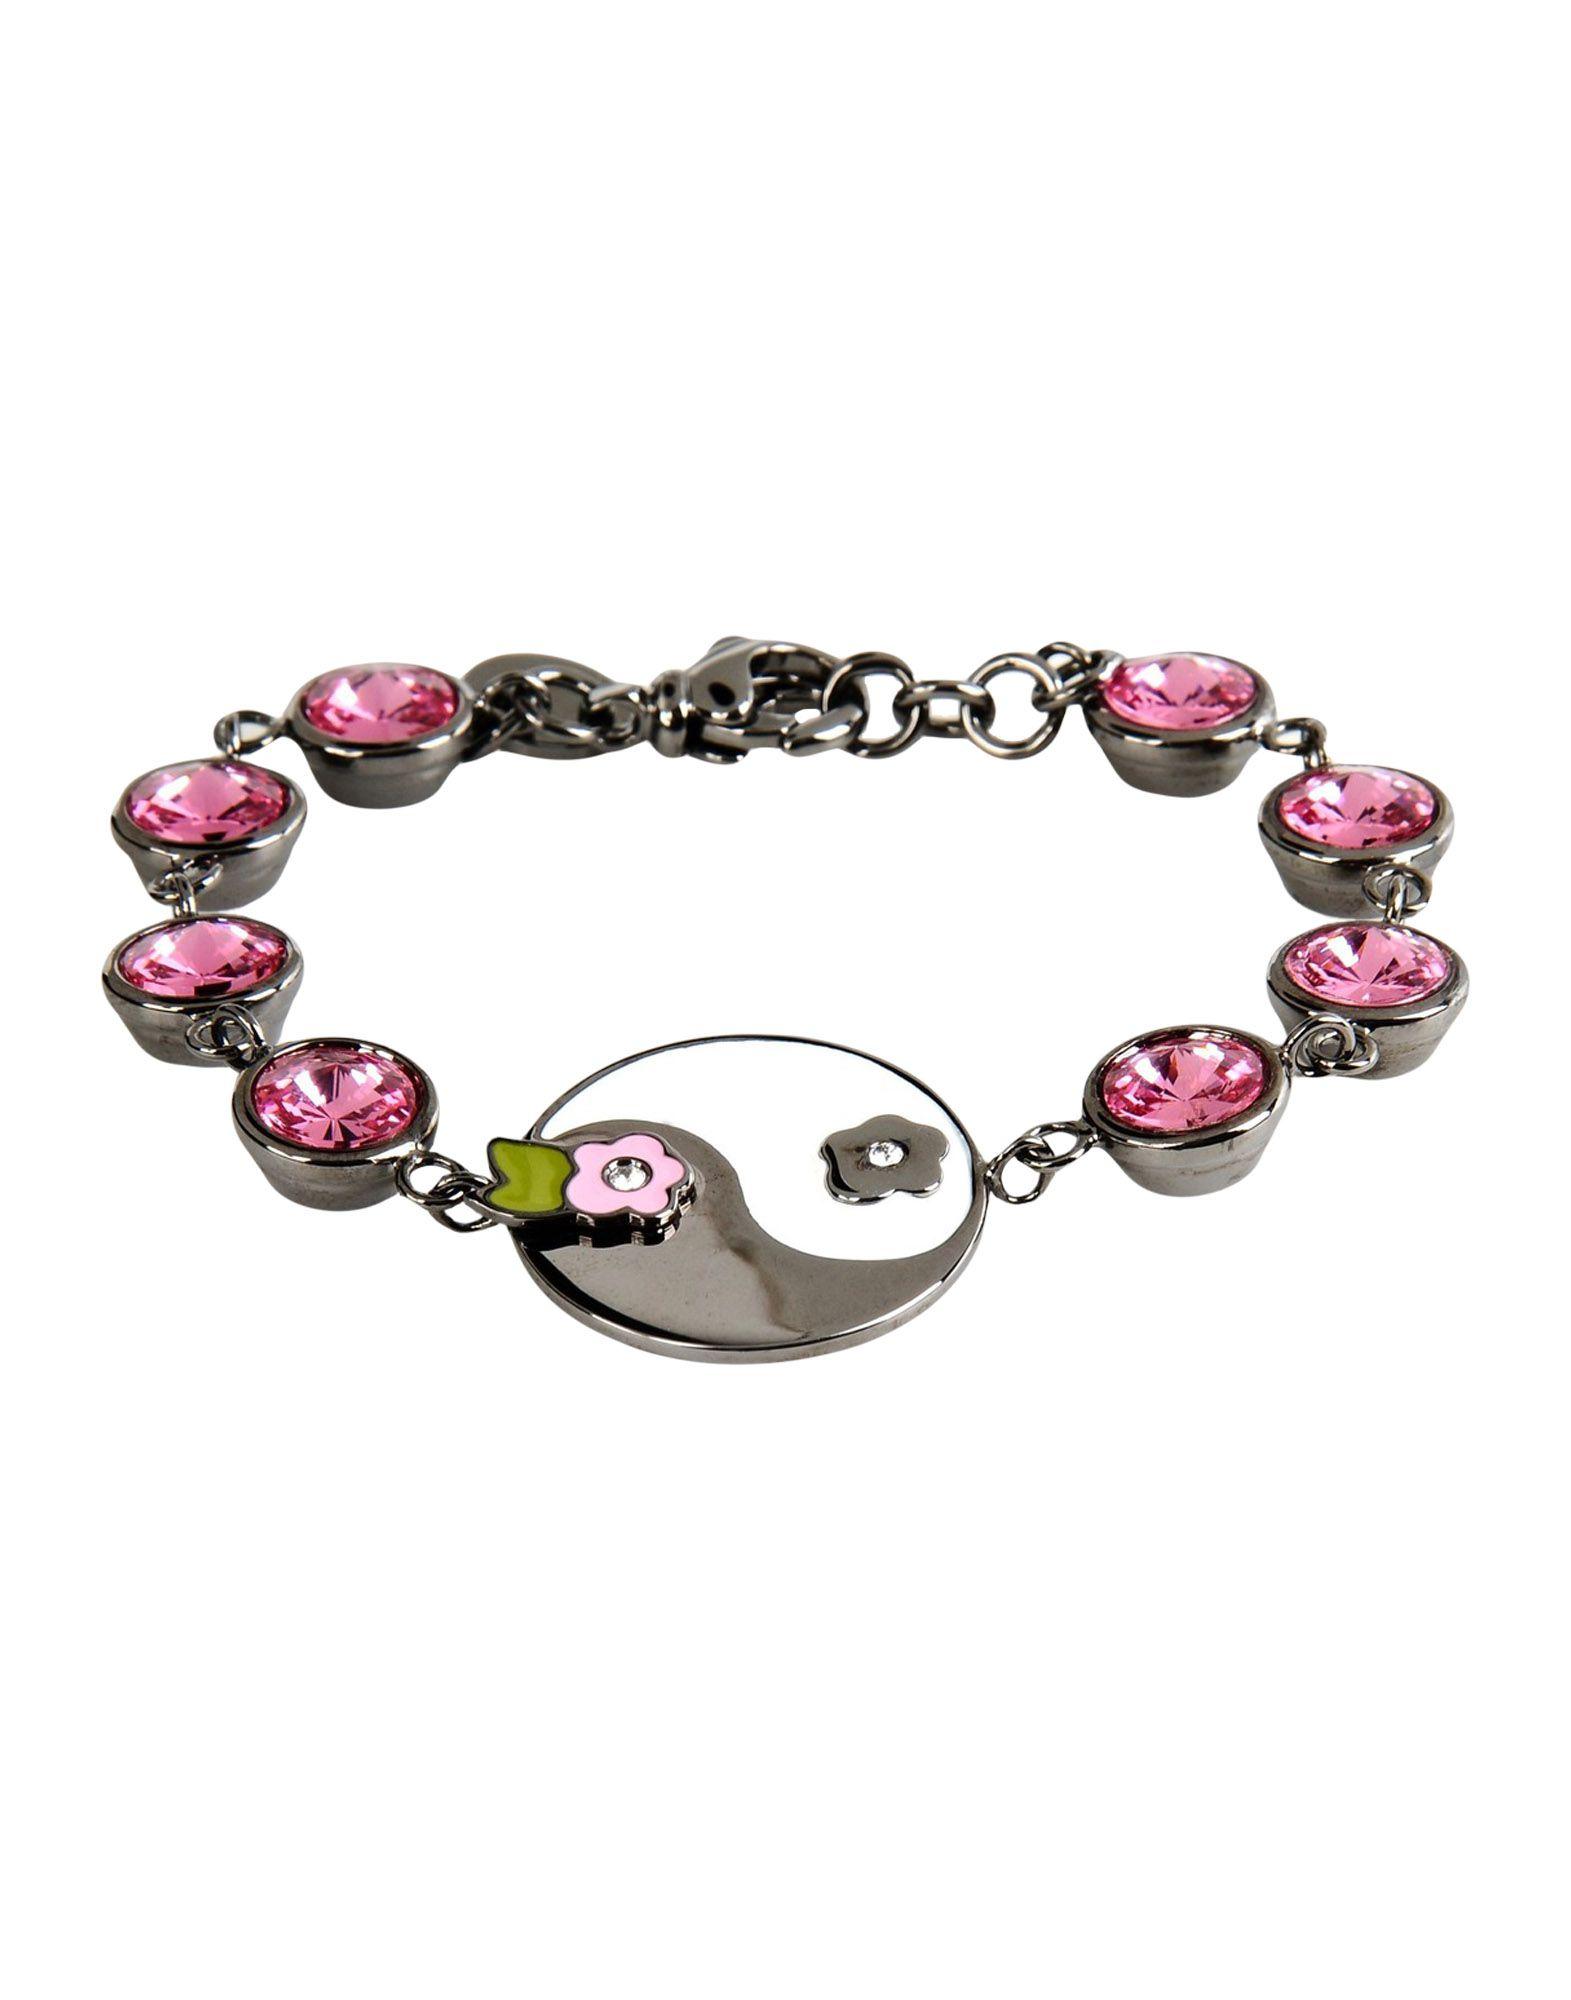 JIWINAIA Bracelets in Fuchsia